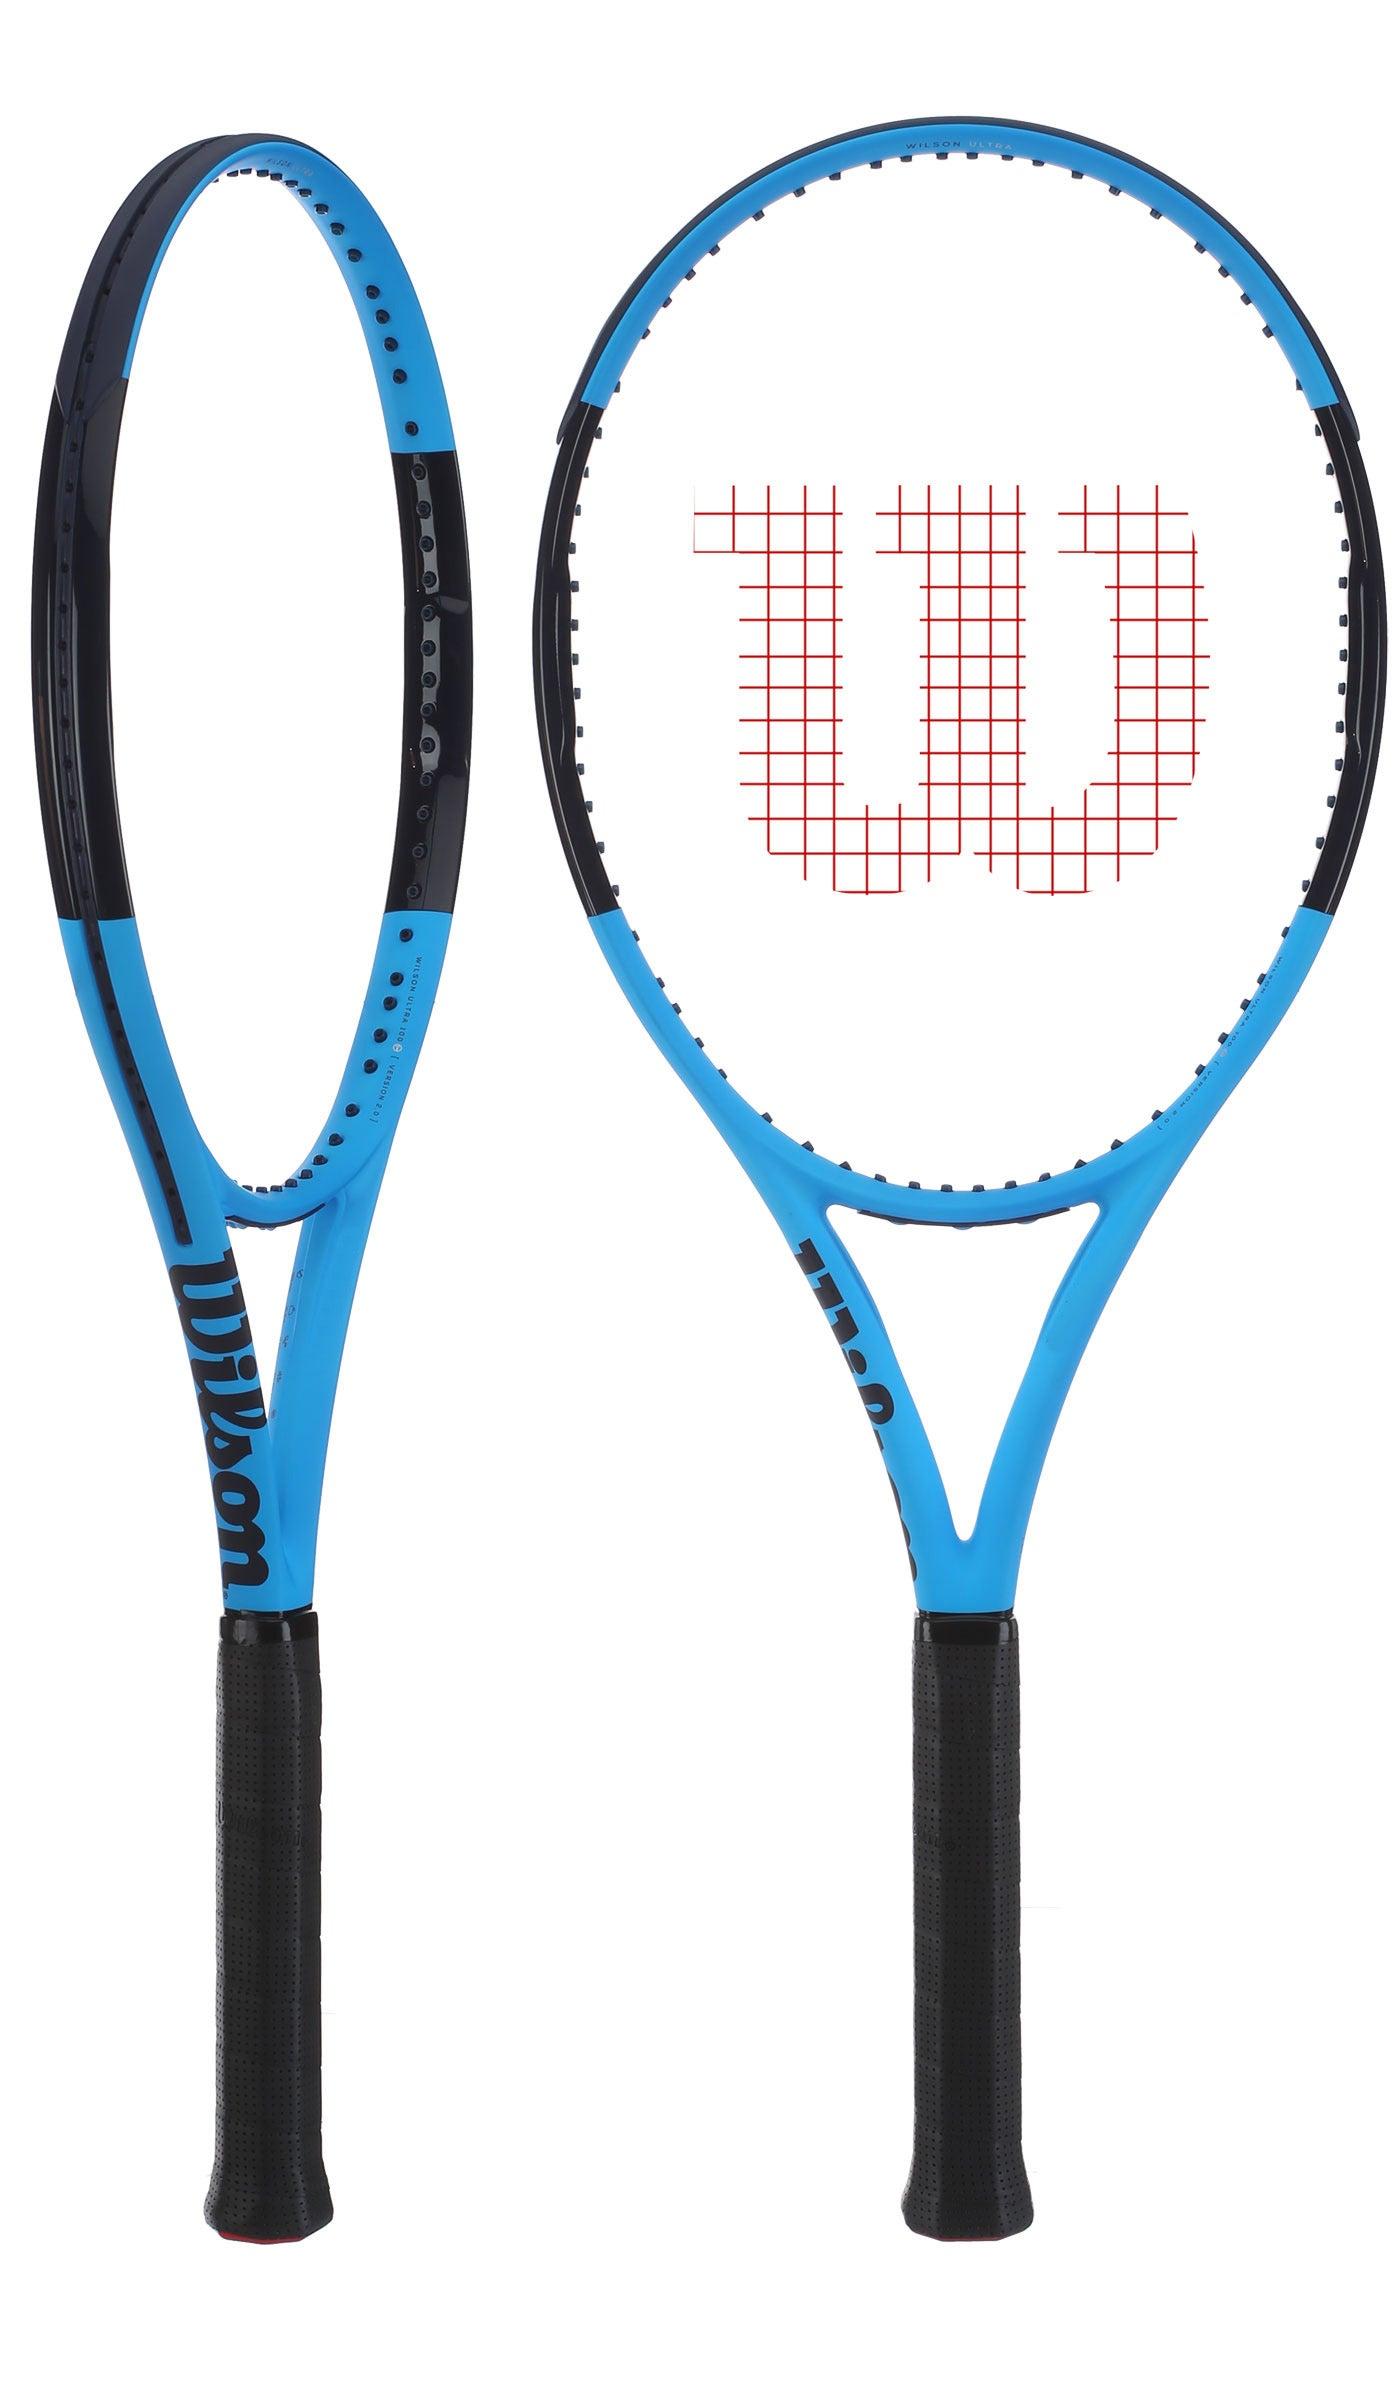 Racchetta Wilson Ultra 100L Reversed - Tennis Warehouse Europe